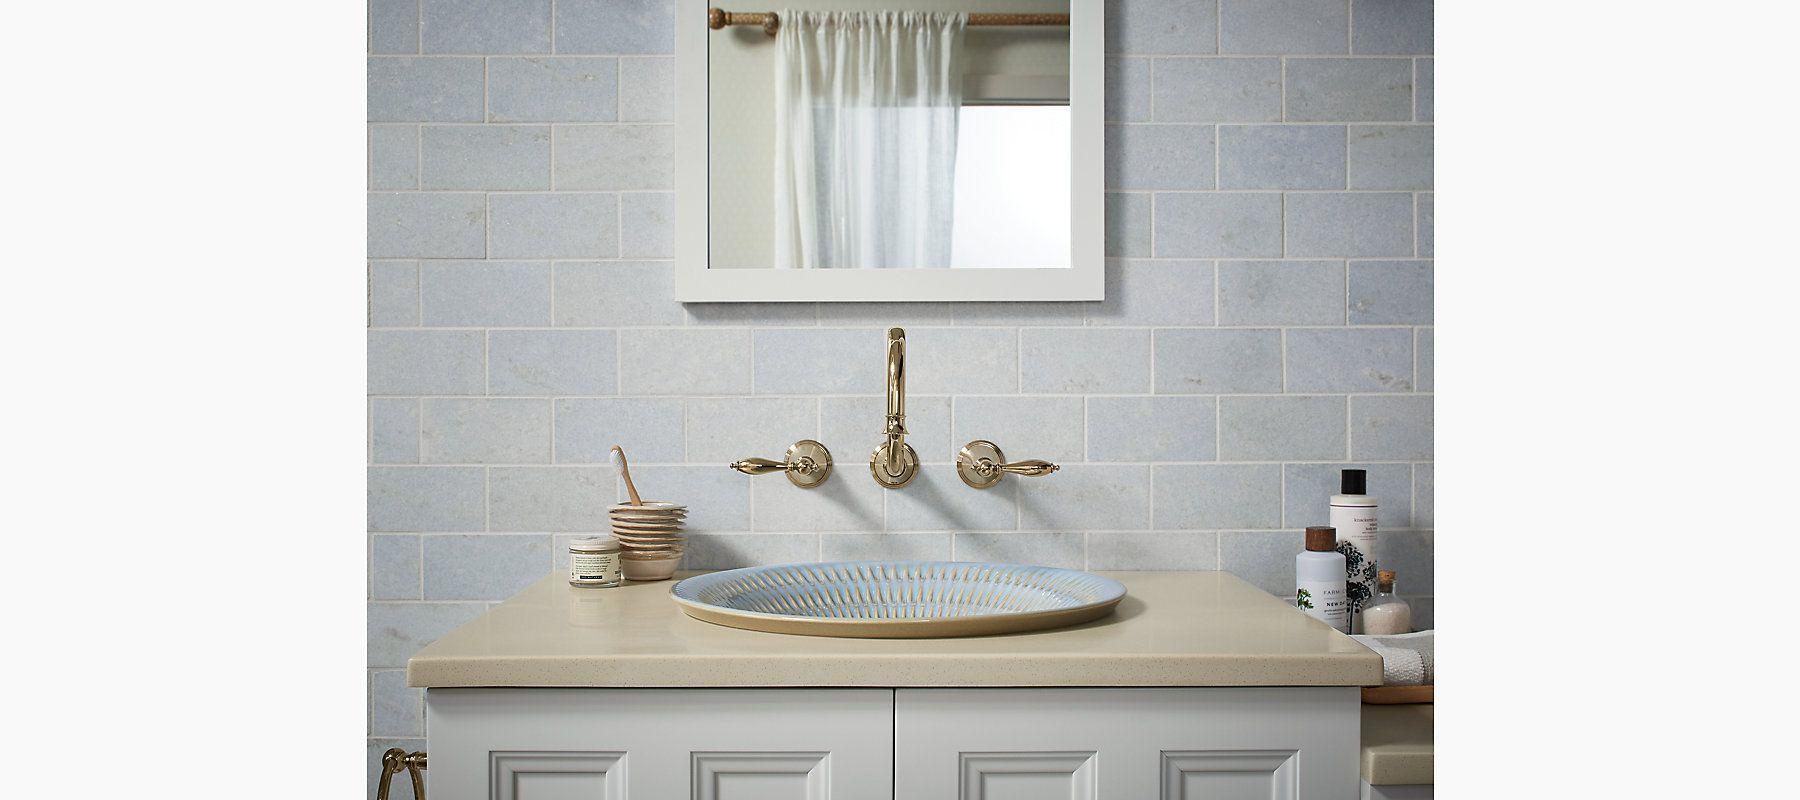 K 17890 Derring Design On Carillon Wading Pool Bathroom Sink